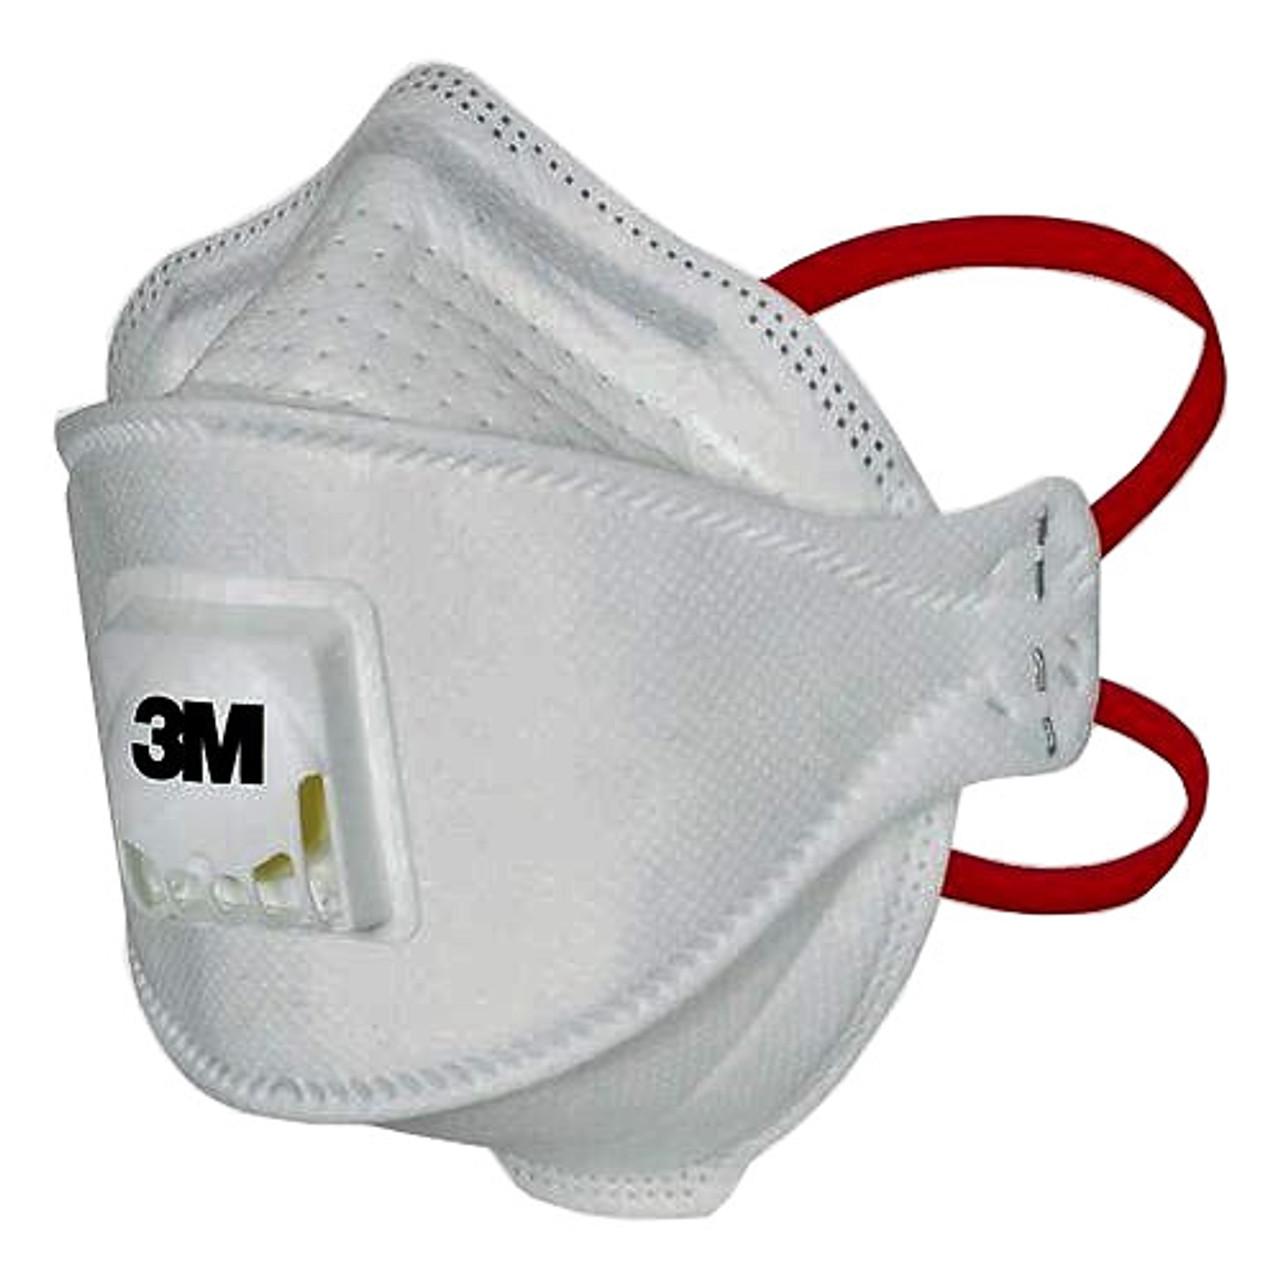 3M 1873v FFP3 Respirator Face Mask with Valve - Made in UK